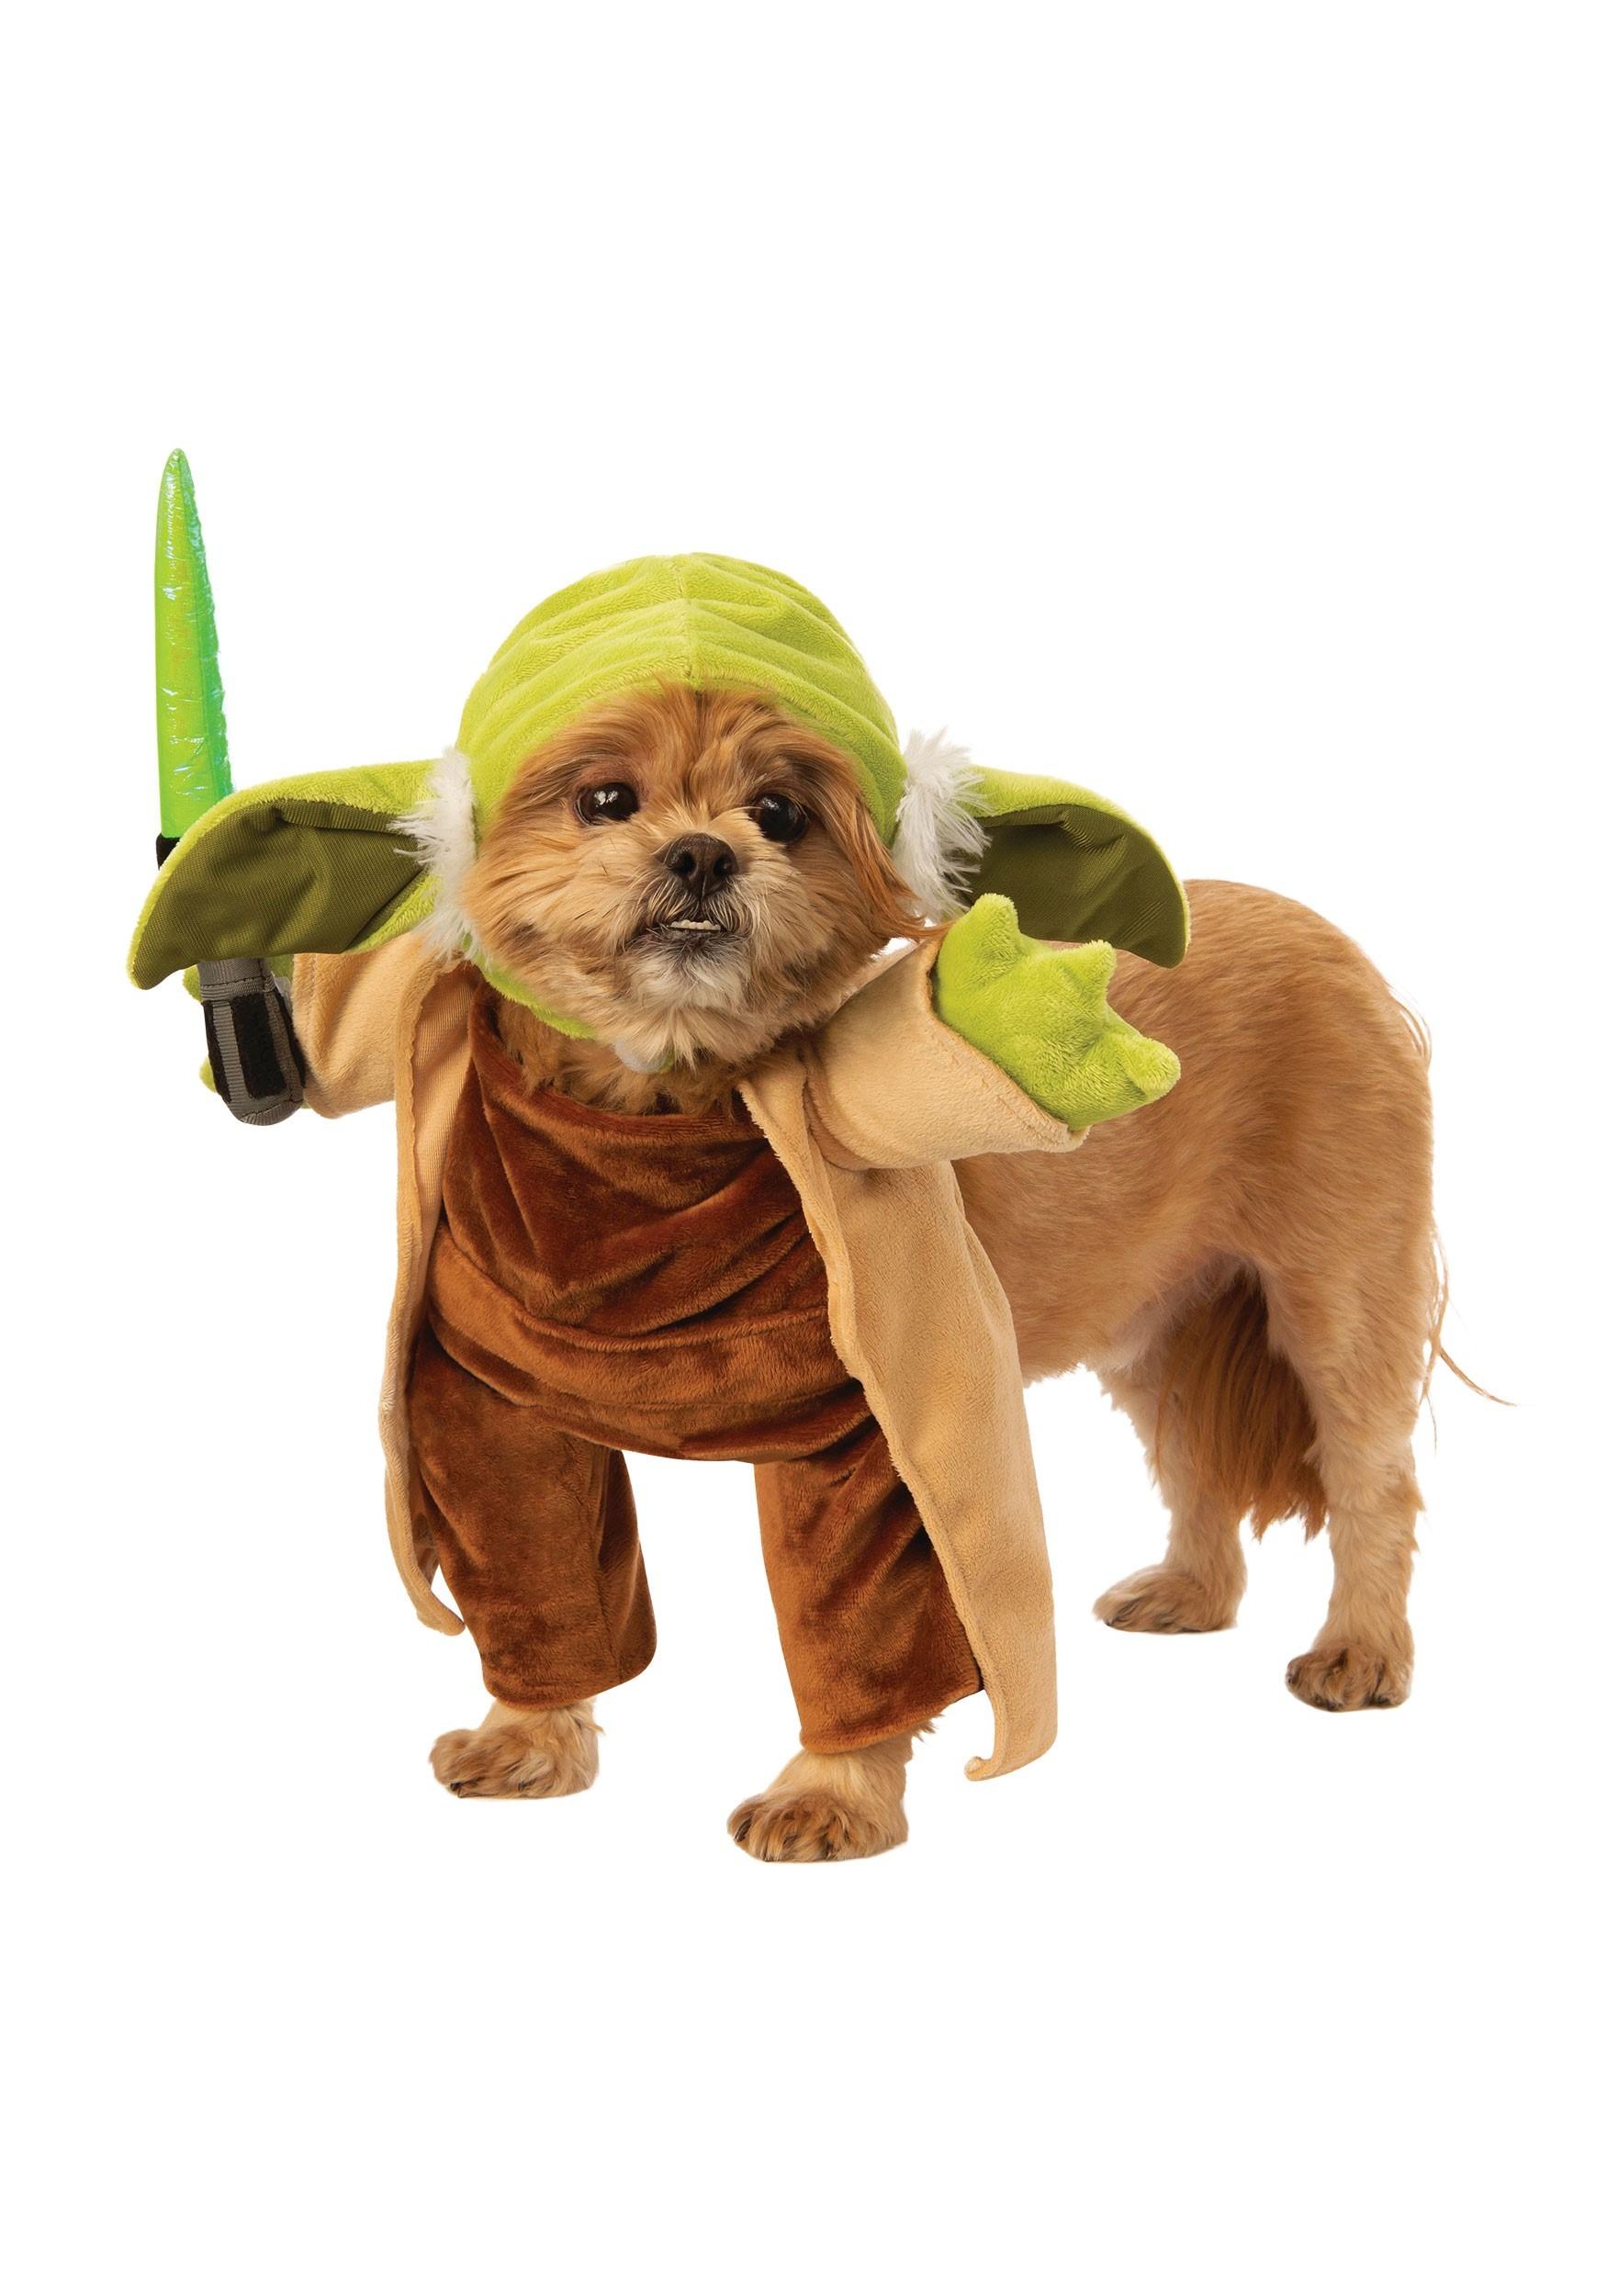 Walking Yoda with Lightsaber Pet Star Wars Costume